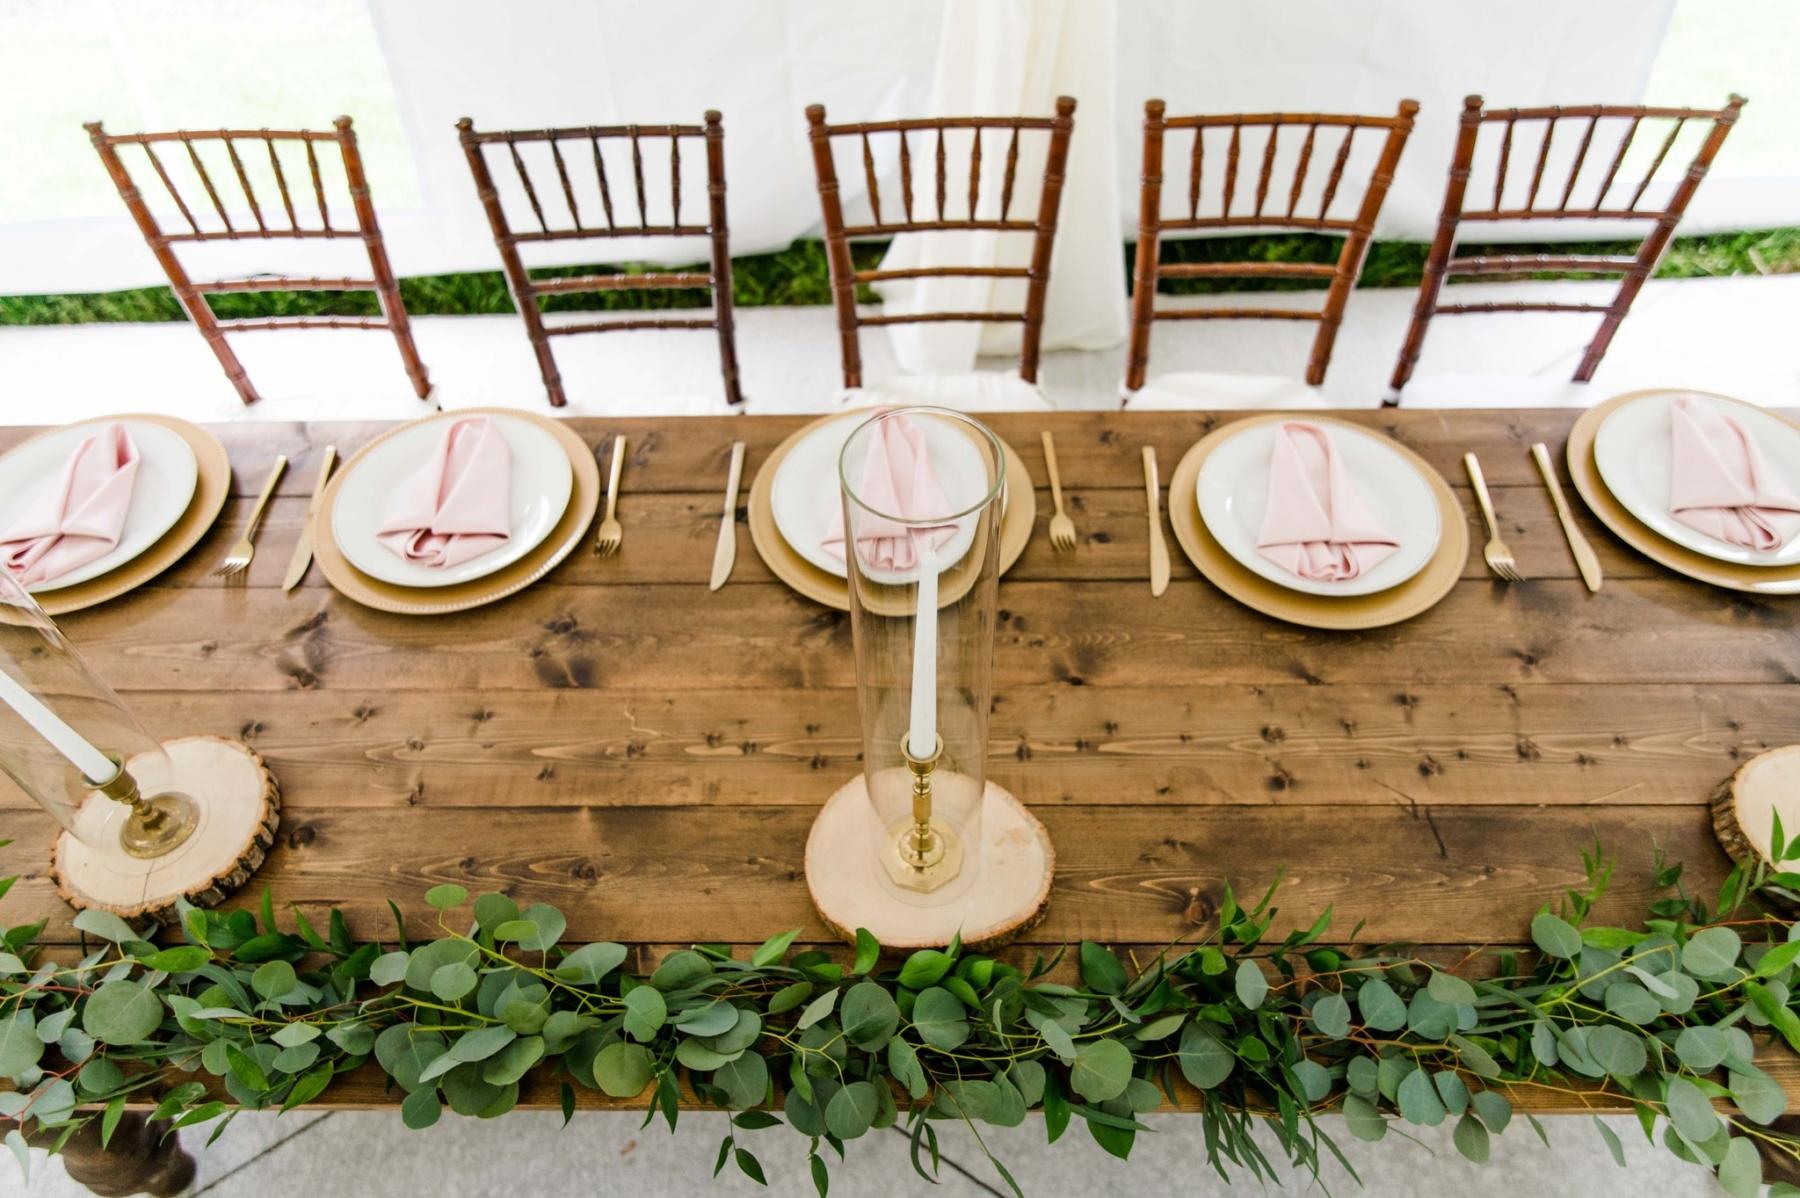 Rustic wedding table with greenery